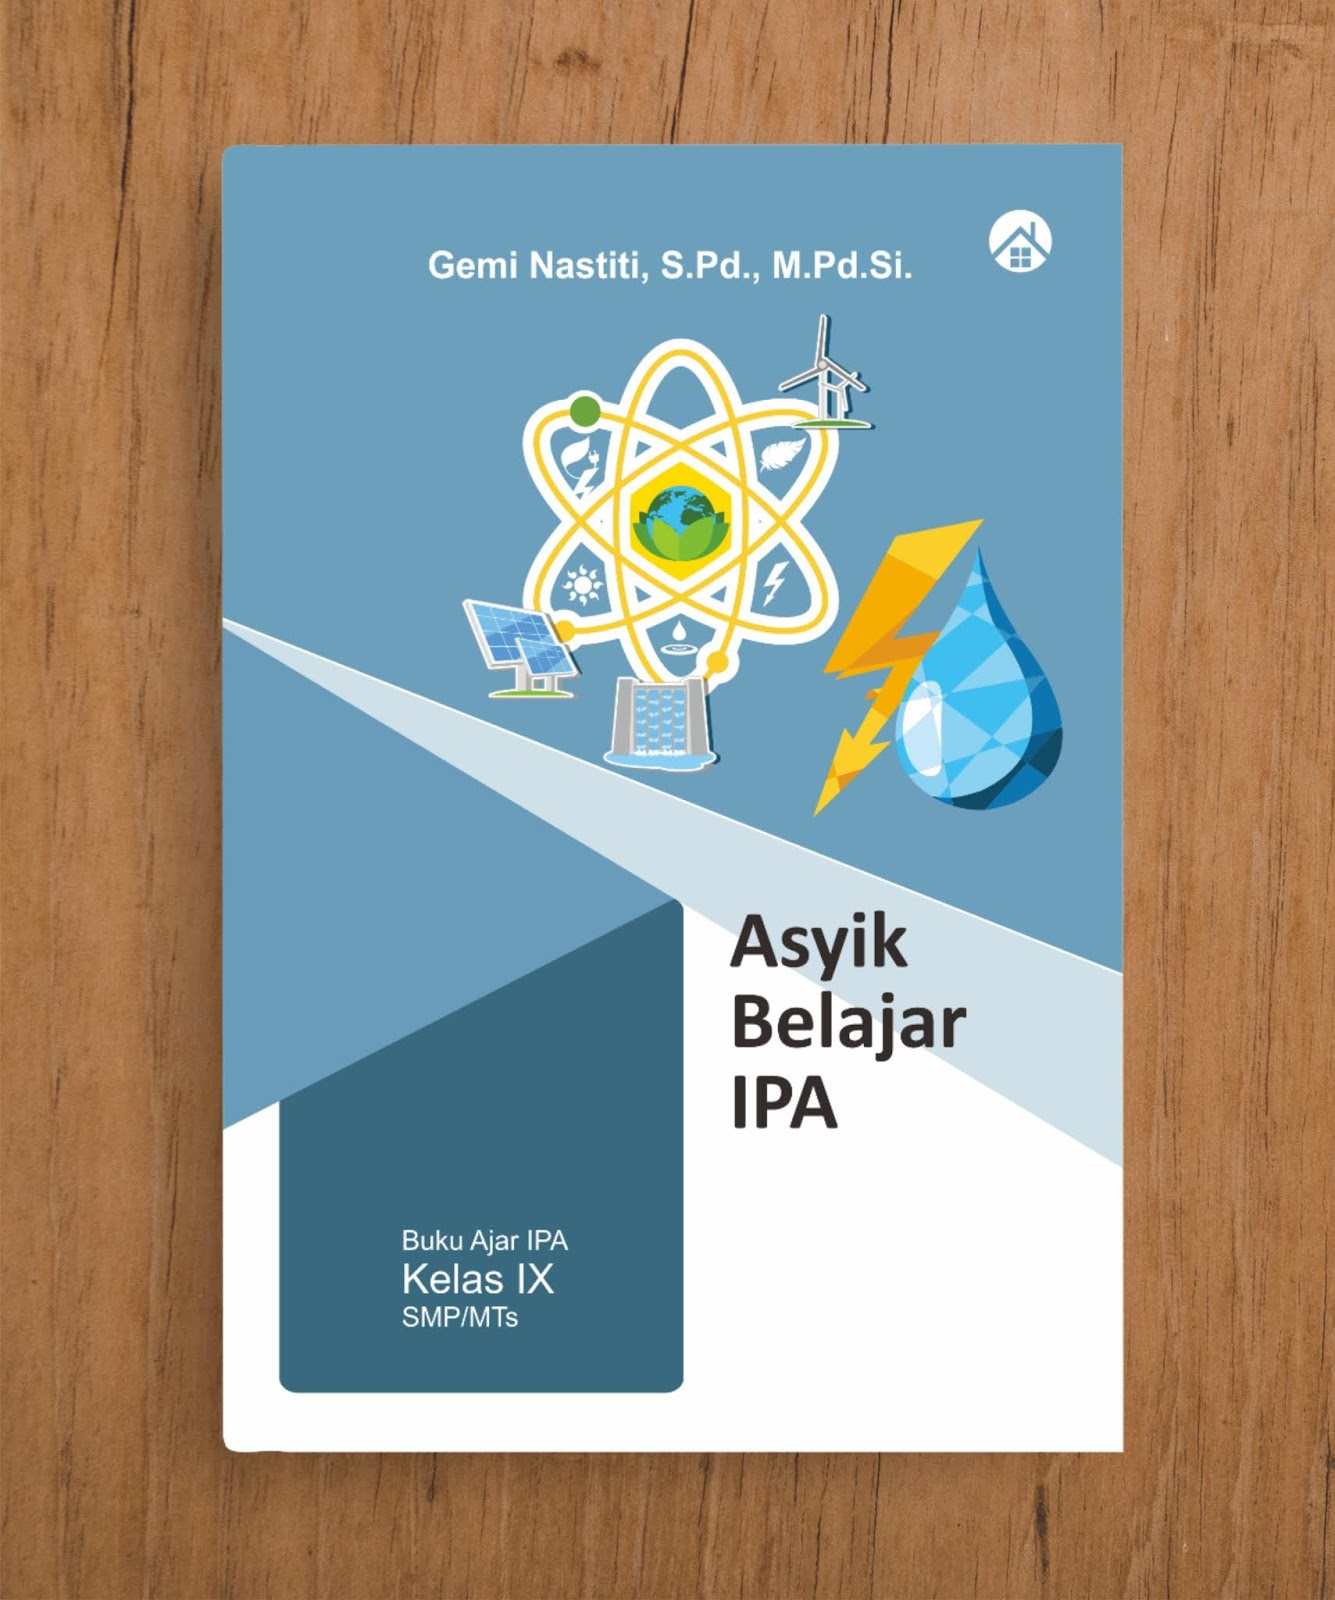 Asyik Belajar IPA (Buku Ajar IPA Kelas IX SMP/MTs